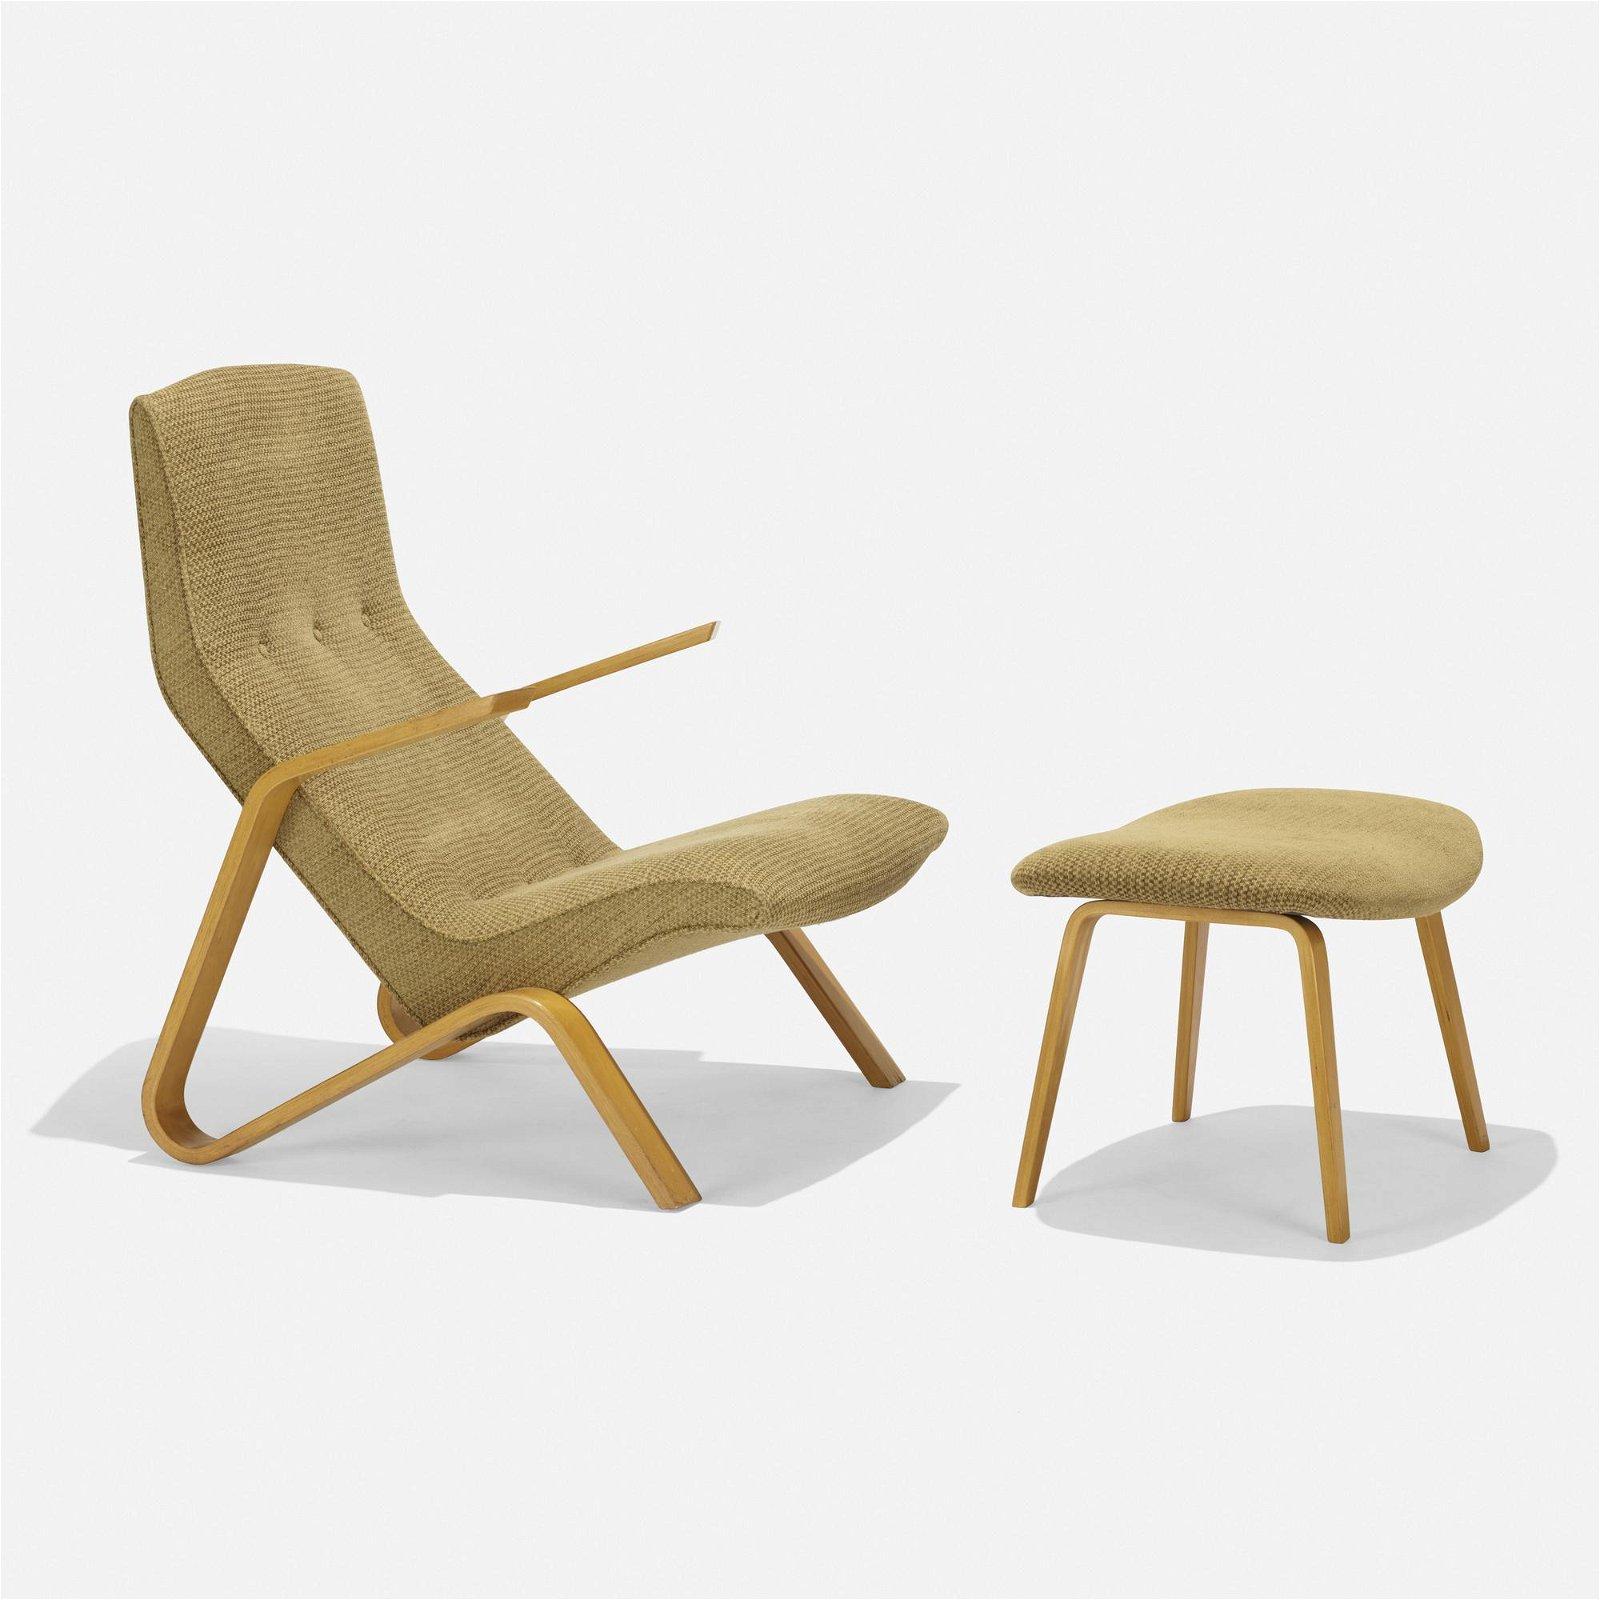 Eero Saarinen, Grasshopper chair and ottoman